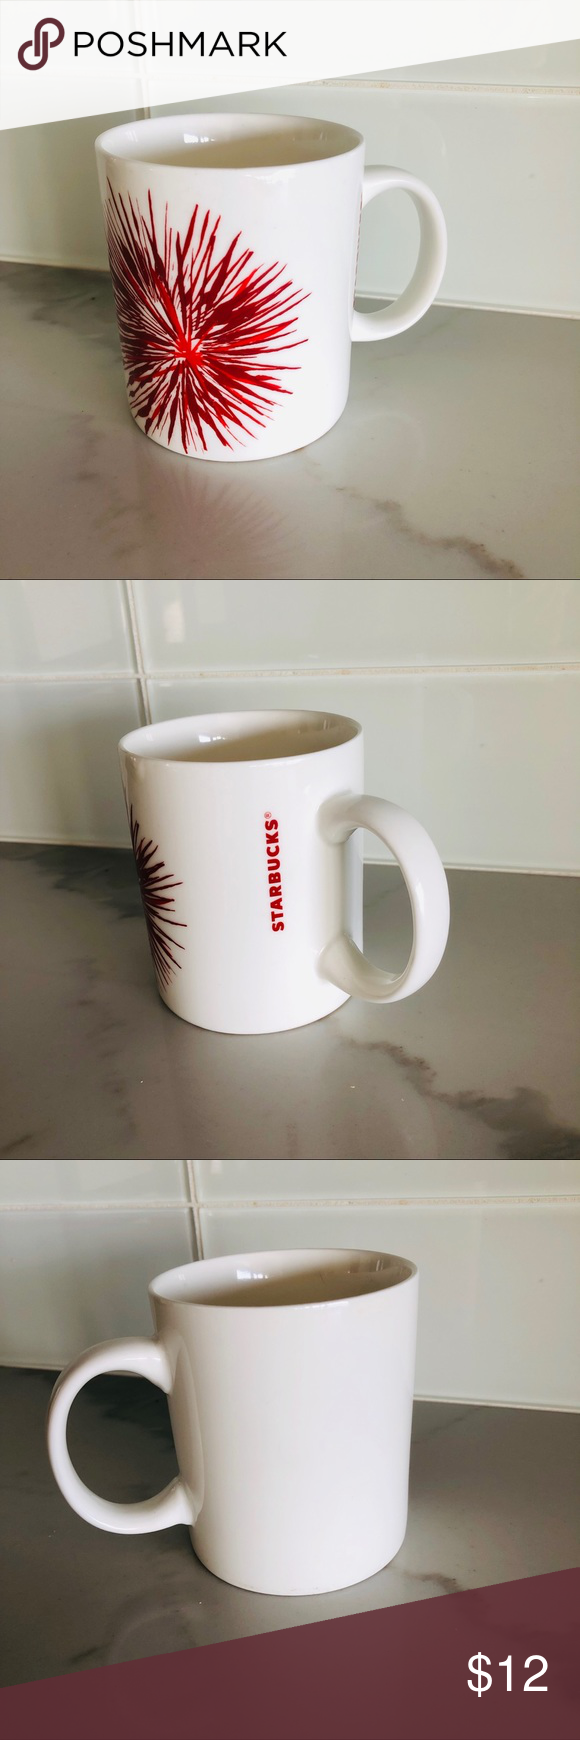 STARBUCKS • 2014 red firework coffee cup 12oz White